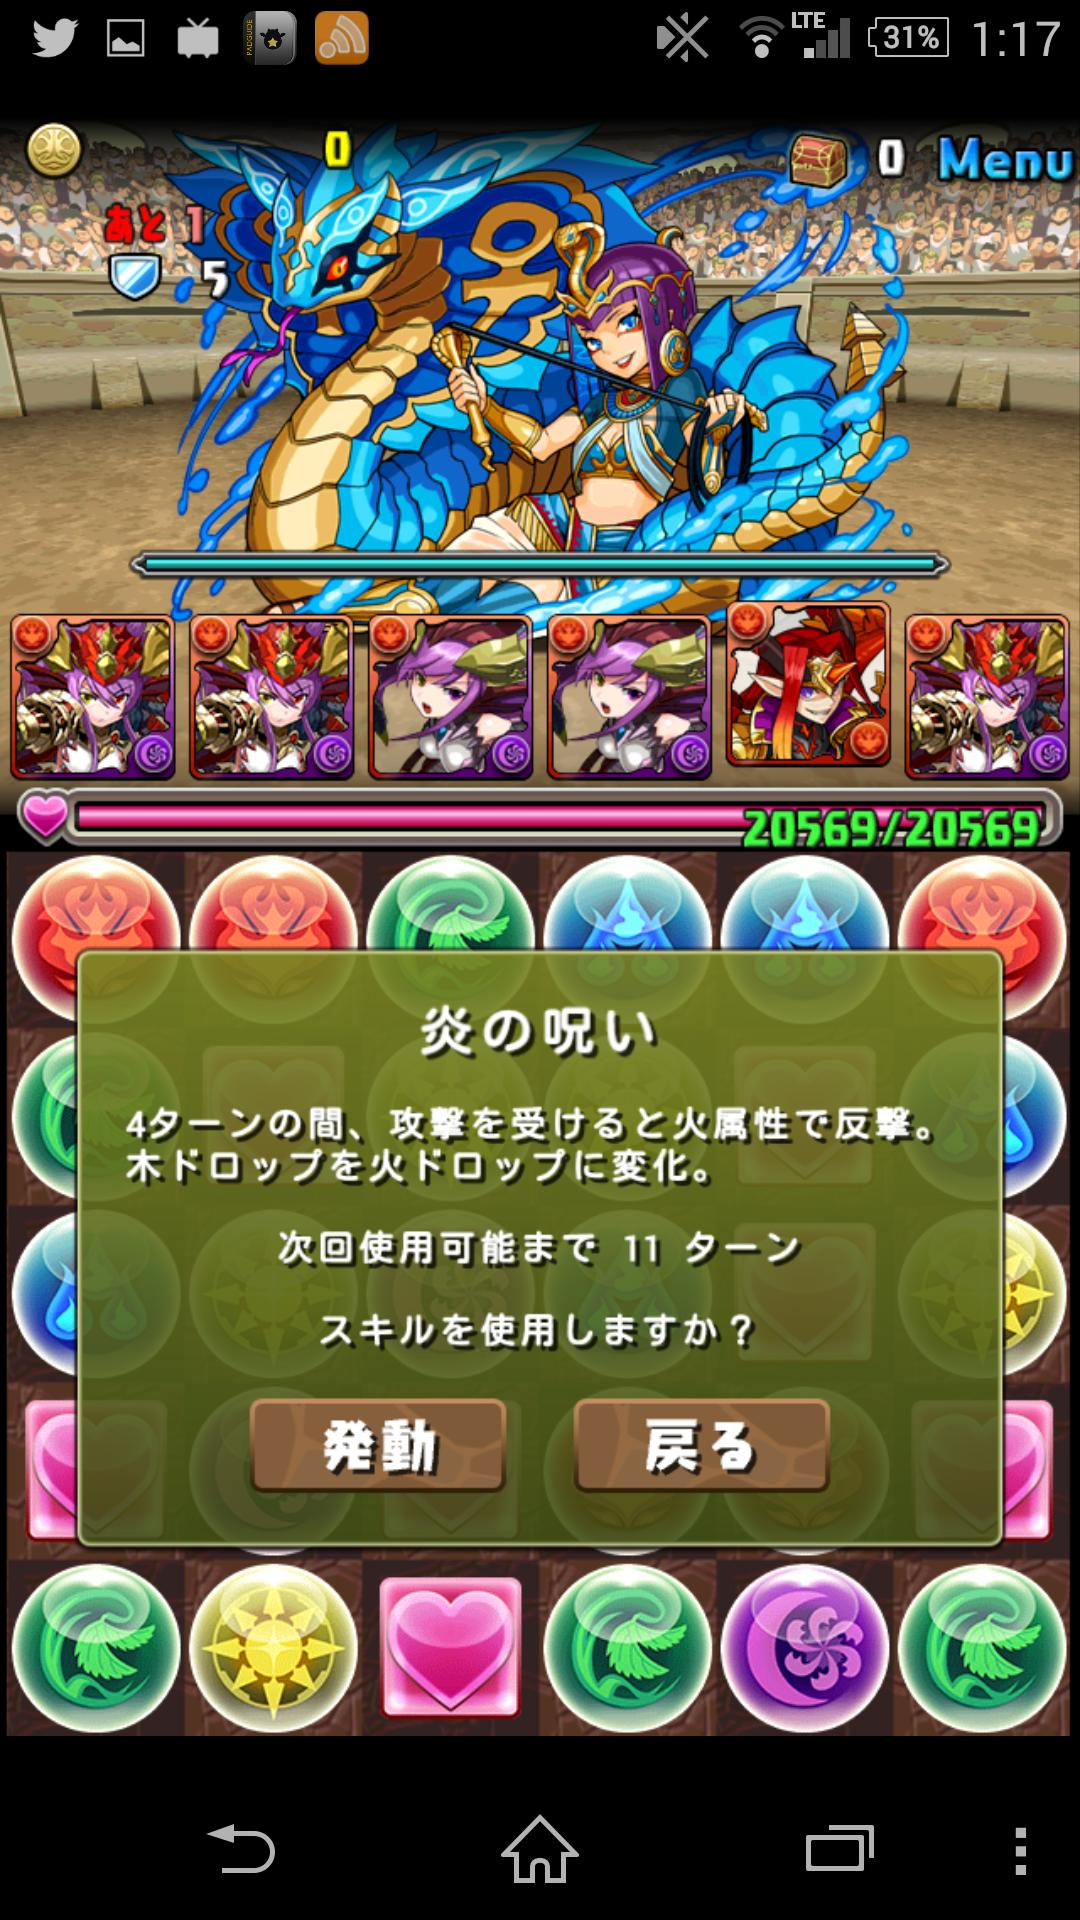 Screenshot_2015-02-11-01-17-59.png